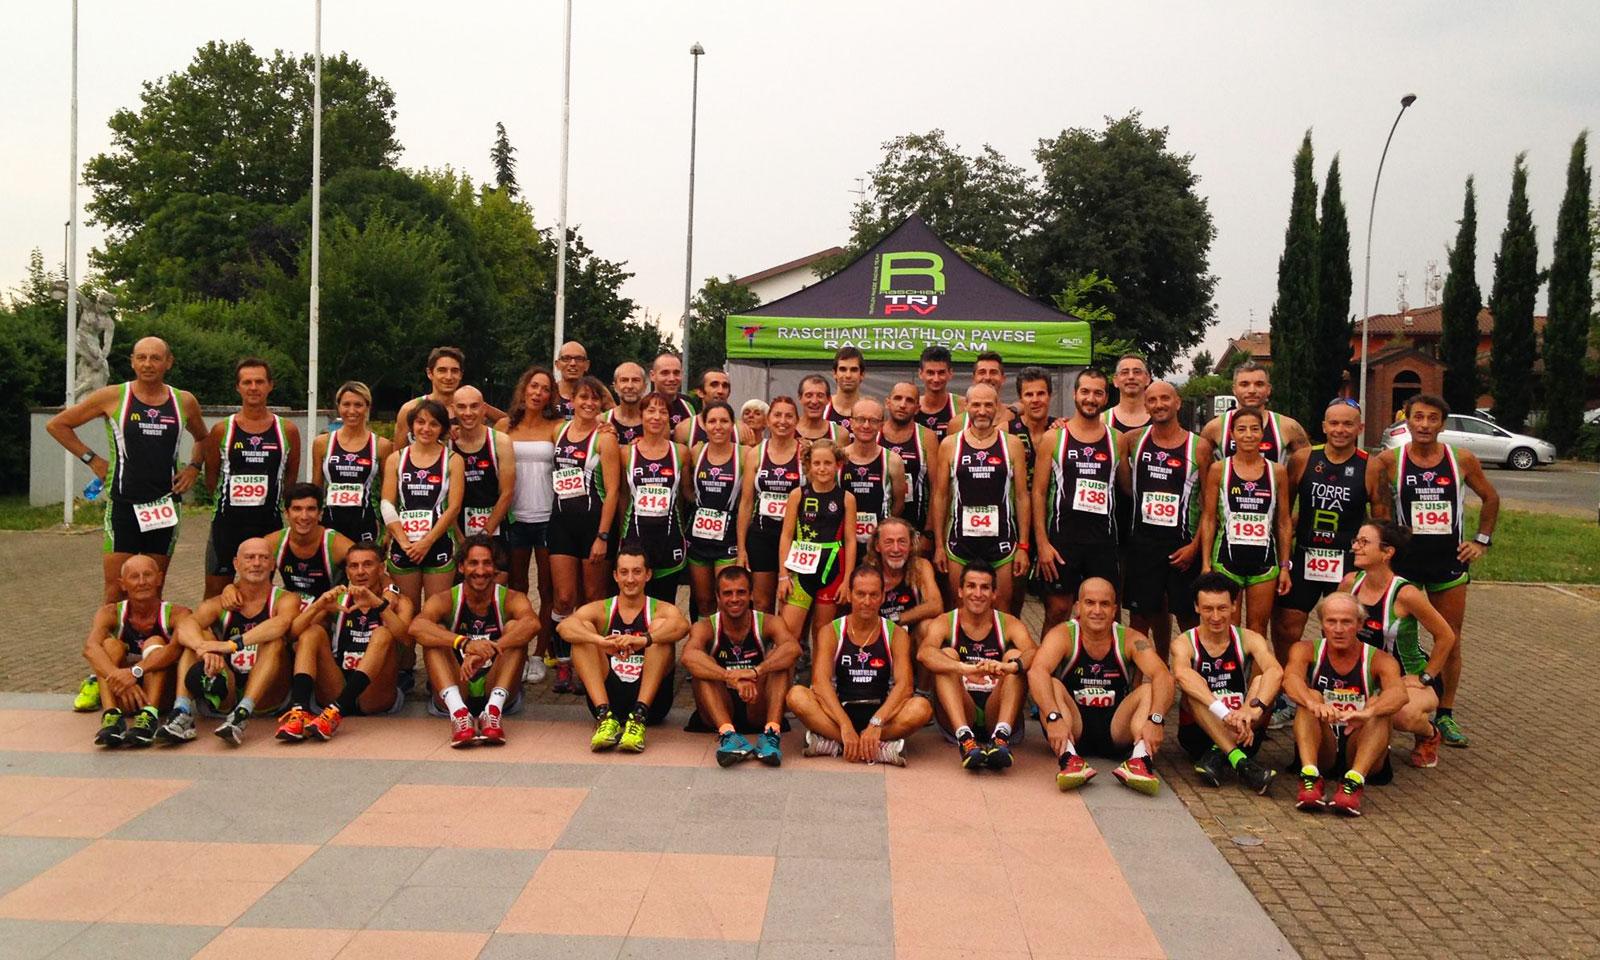 triathlon-pavese-raschiani-pavia-cycling-running-23